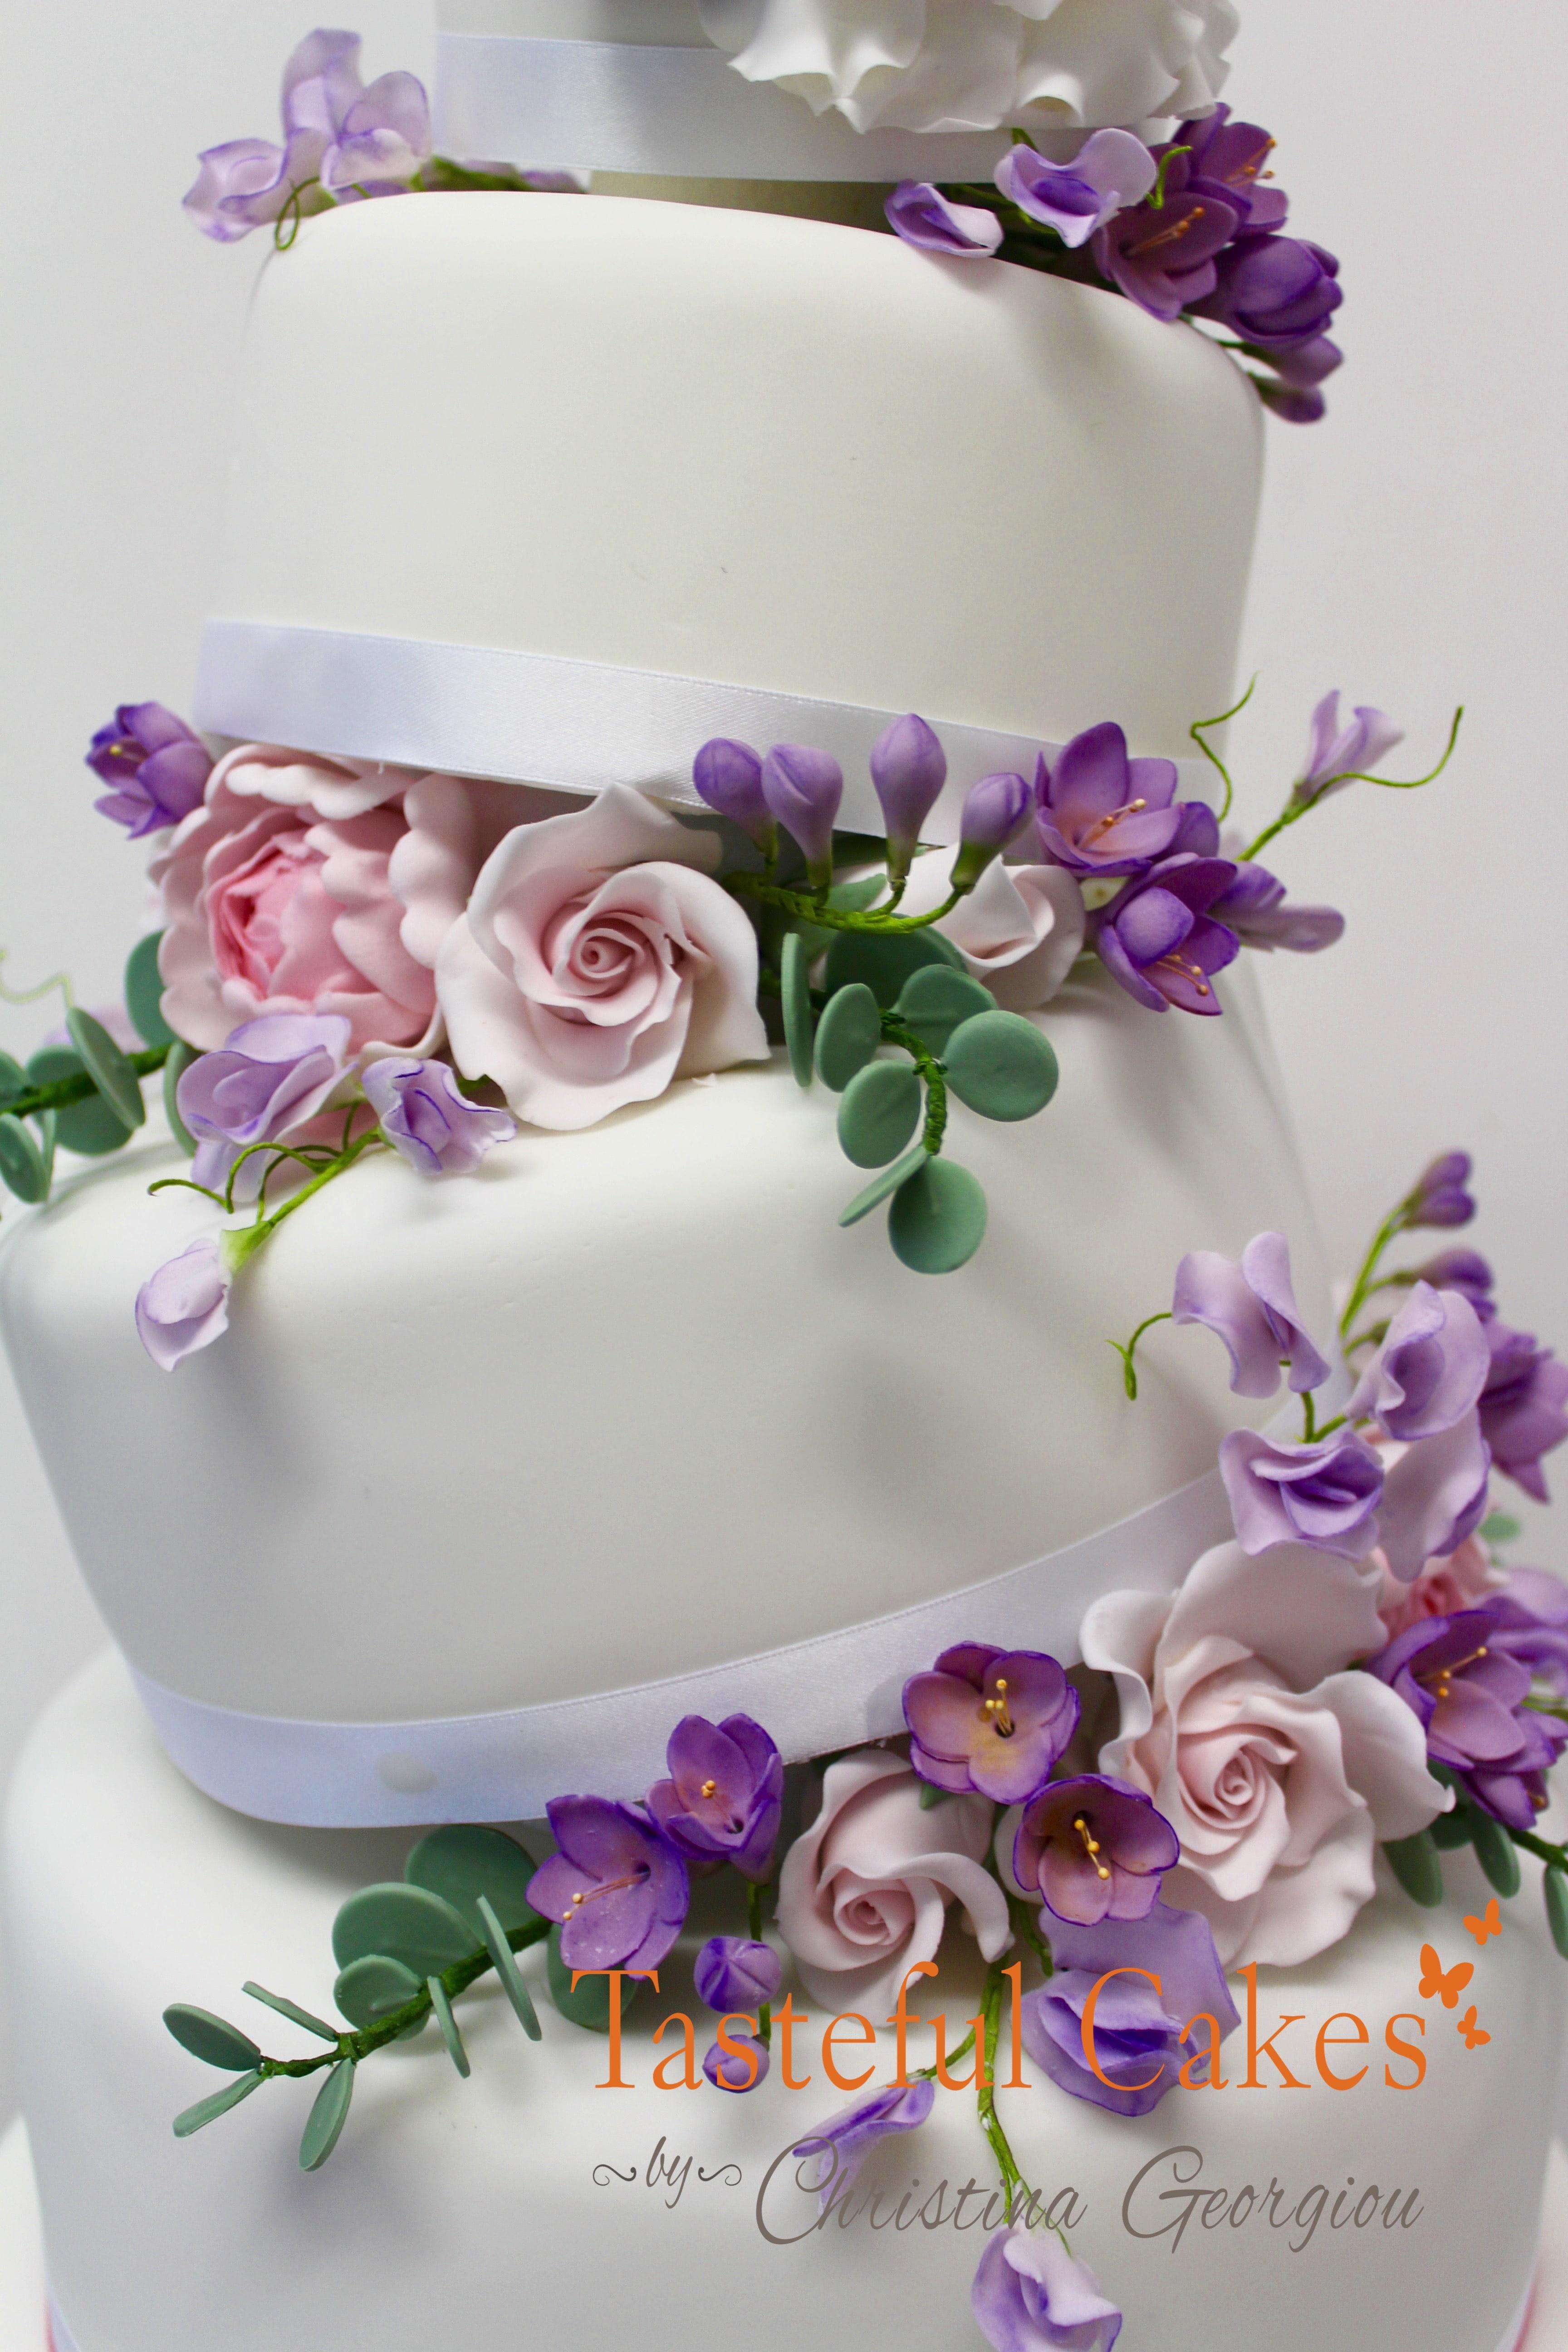 Tasteful Cakes By Christina Georgiou | Tasteful Cakes ...